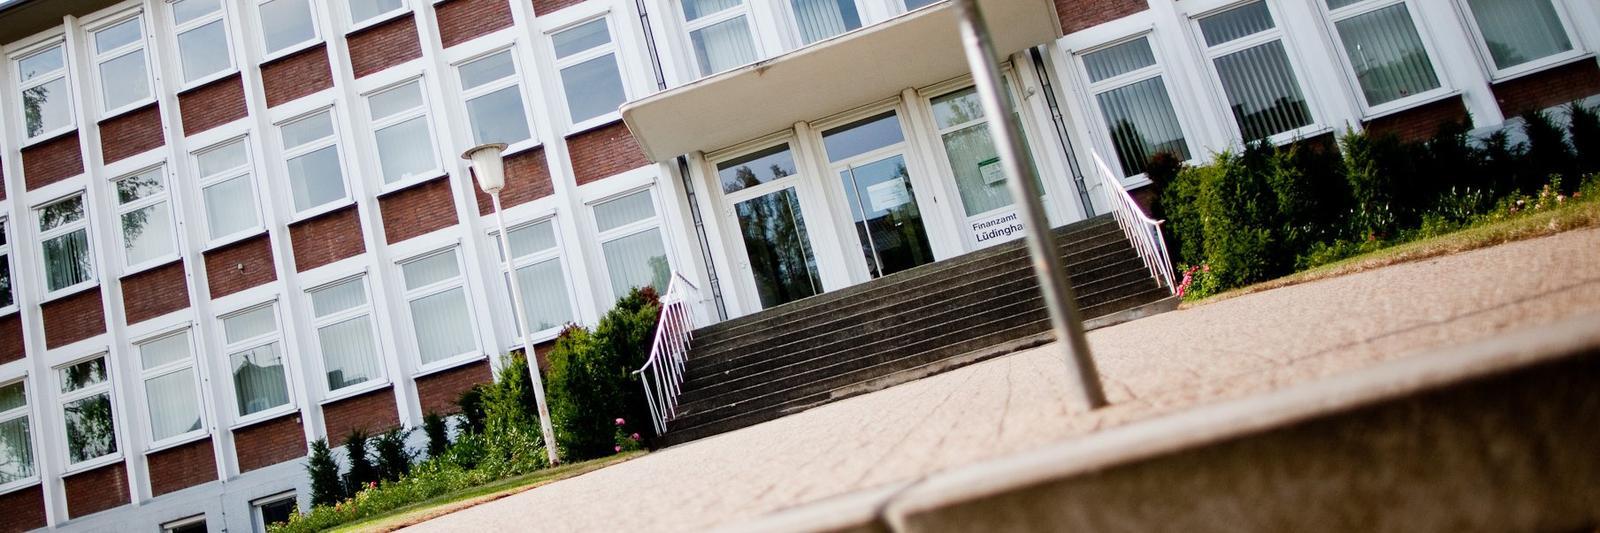 Finanzamt Lüdinghausen